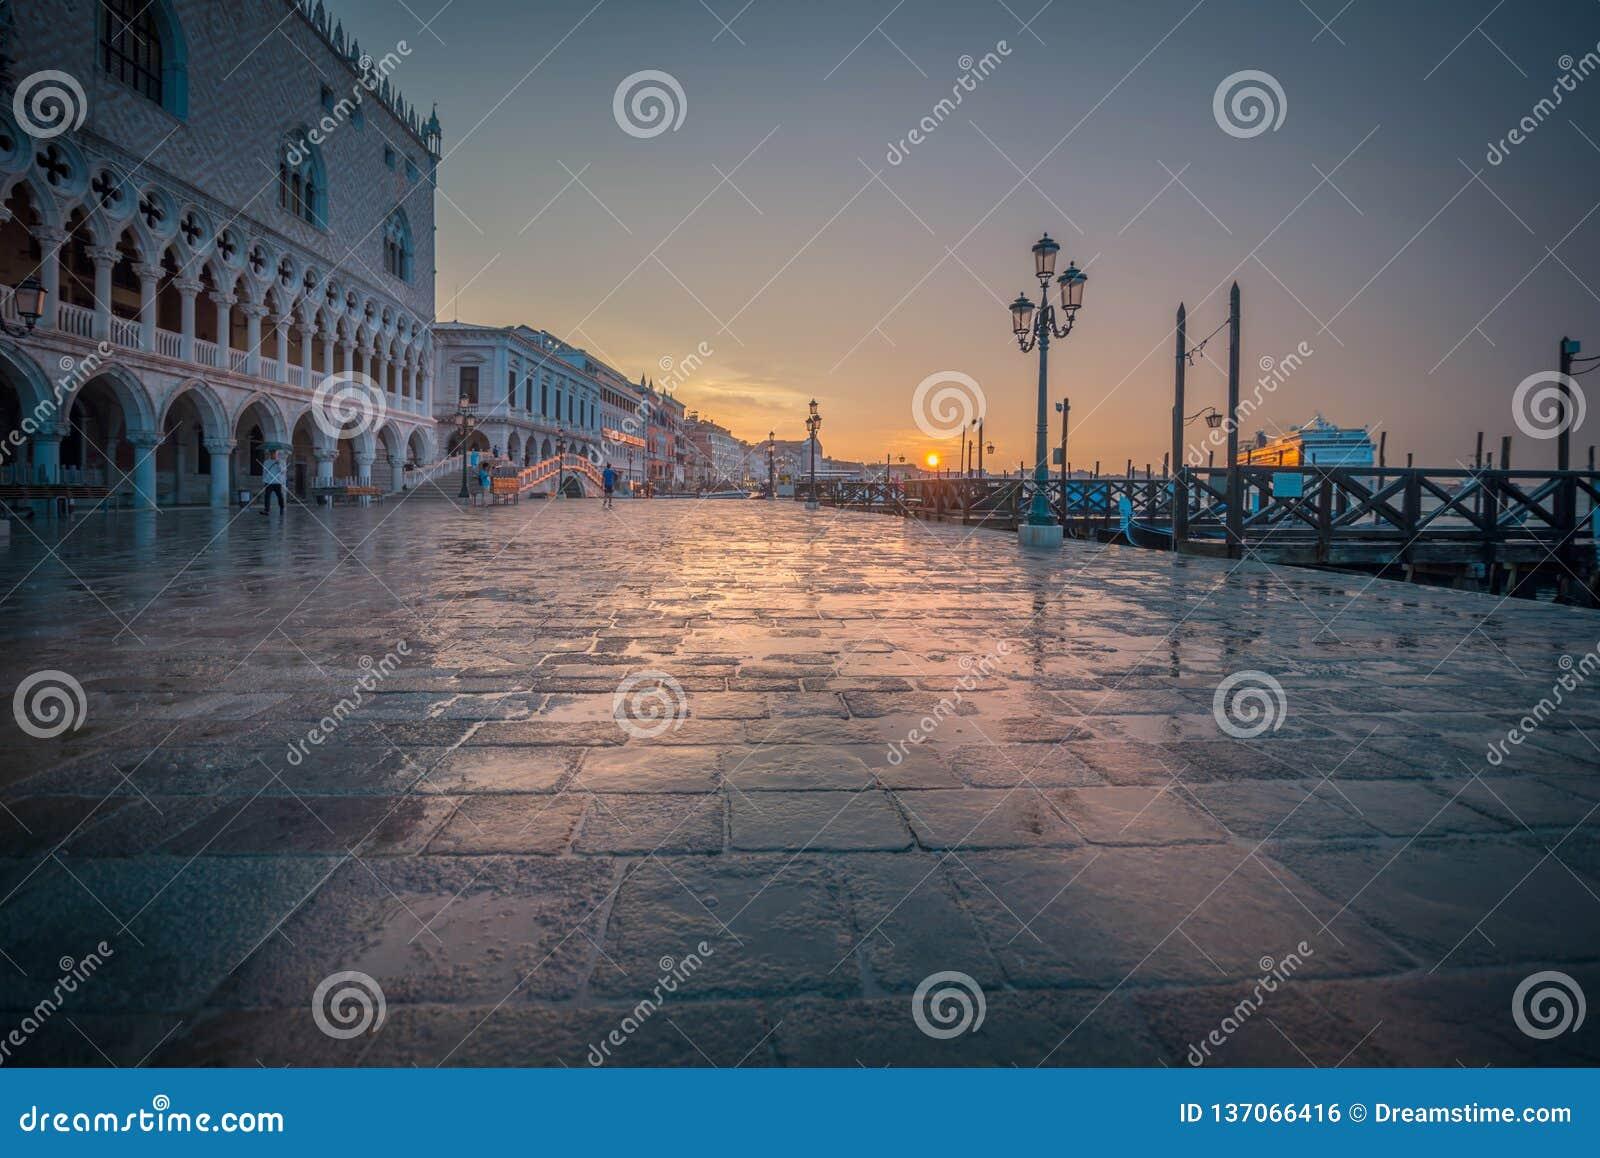 Regenachtige zonsopgang in Venetië